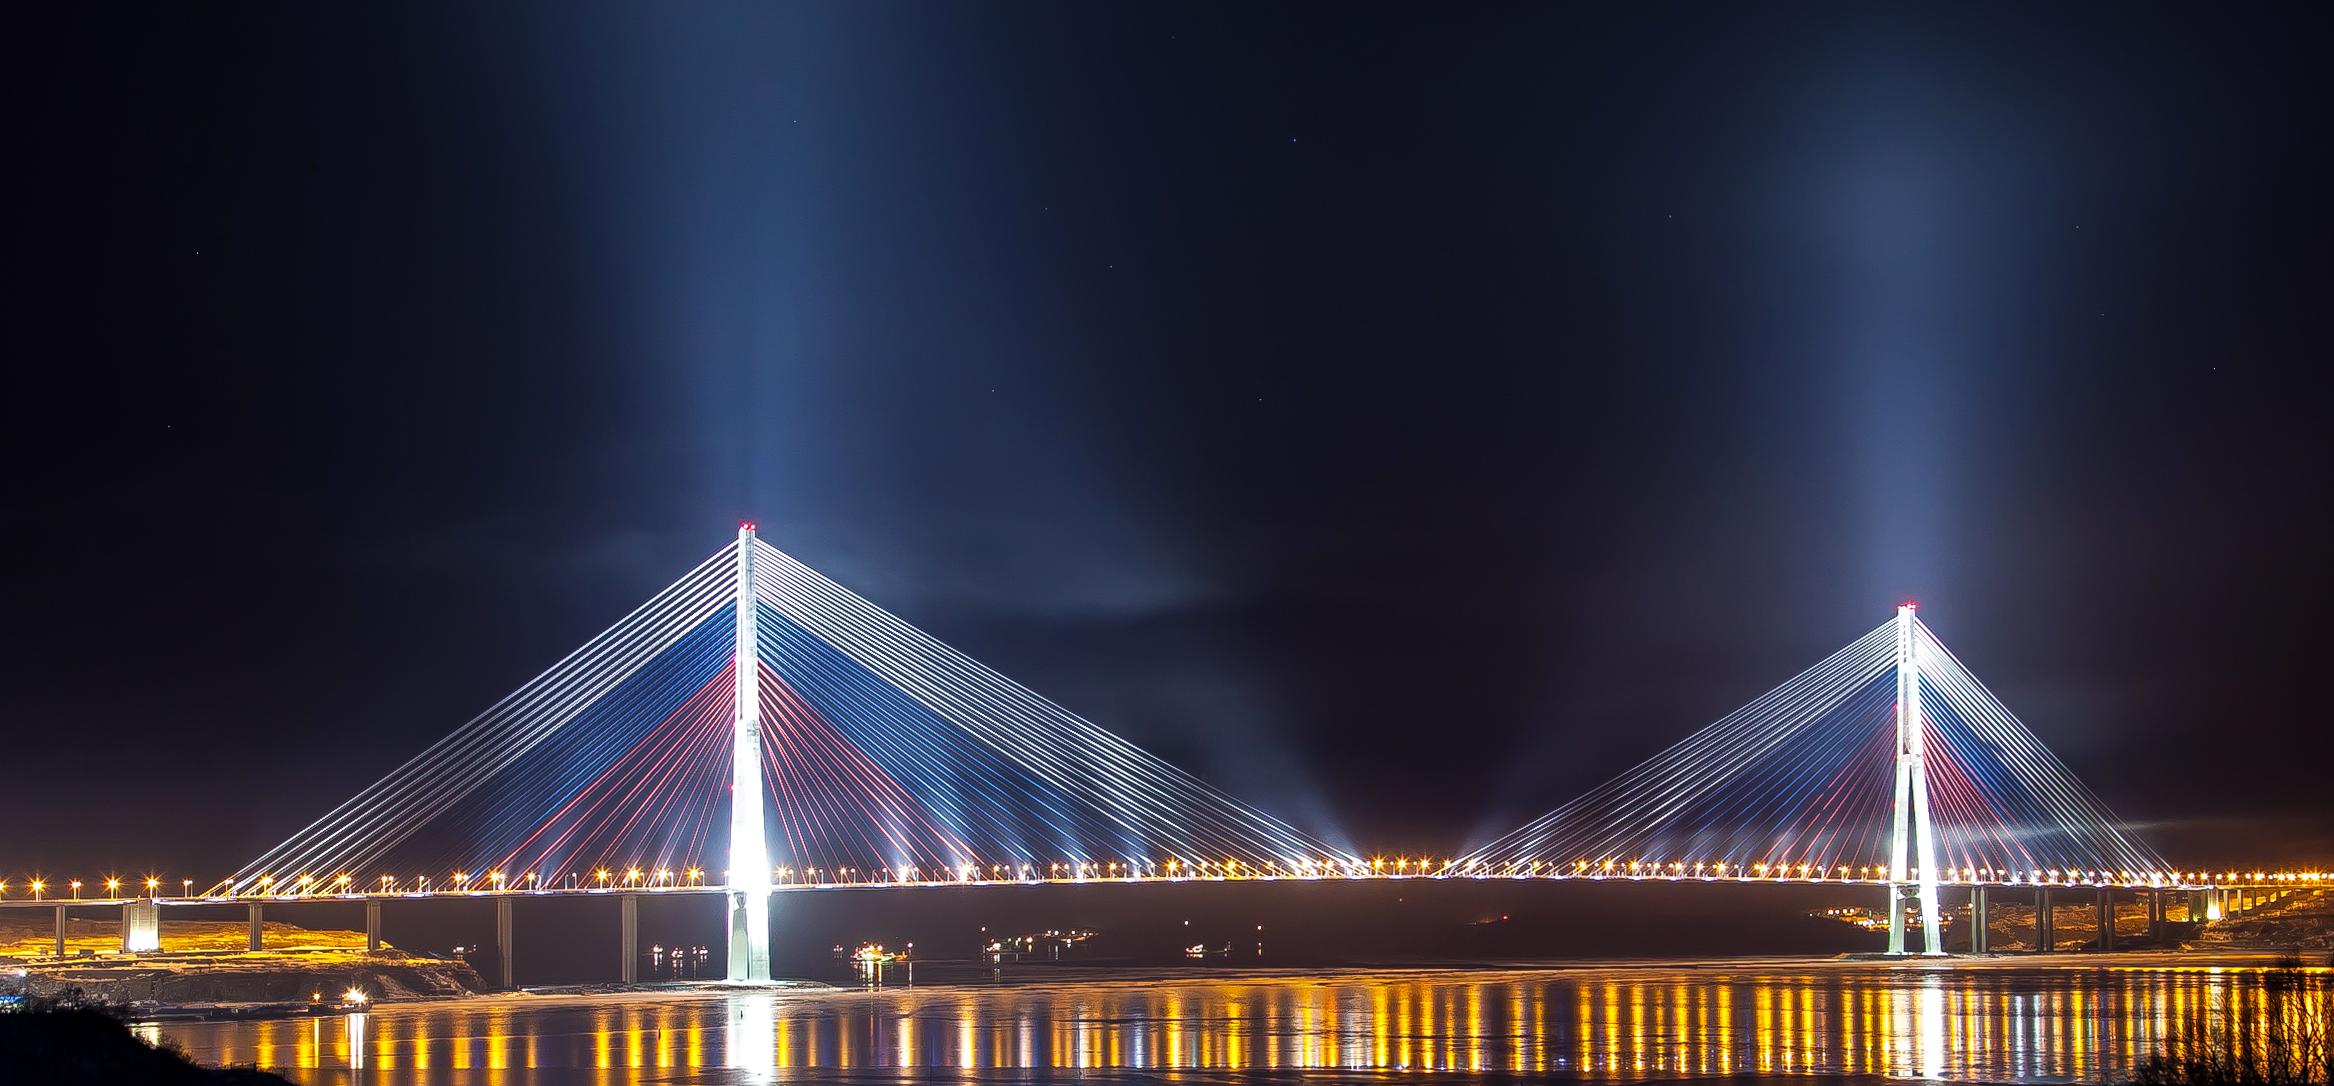 https://upload.wikimedia.org/wikipedia/commons/e/eb/%22Russian_bridge%22_in_Vladivostok.jpg